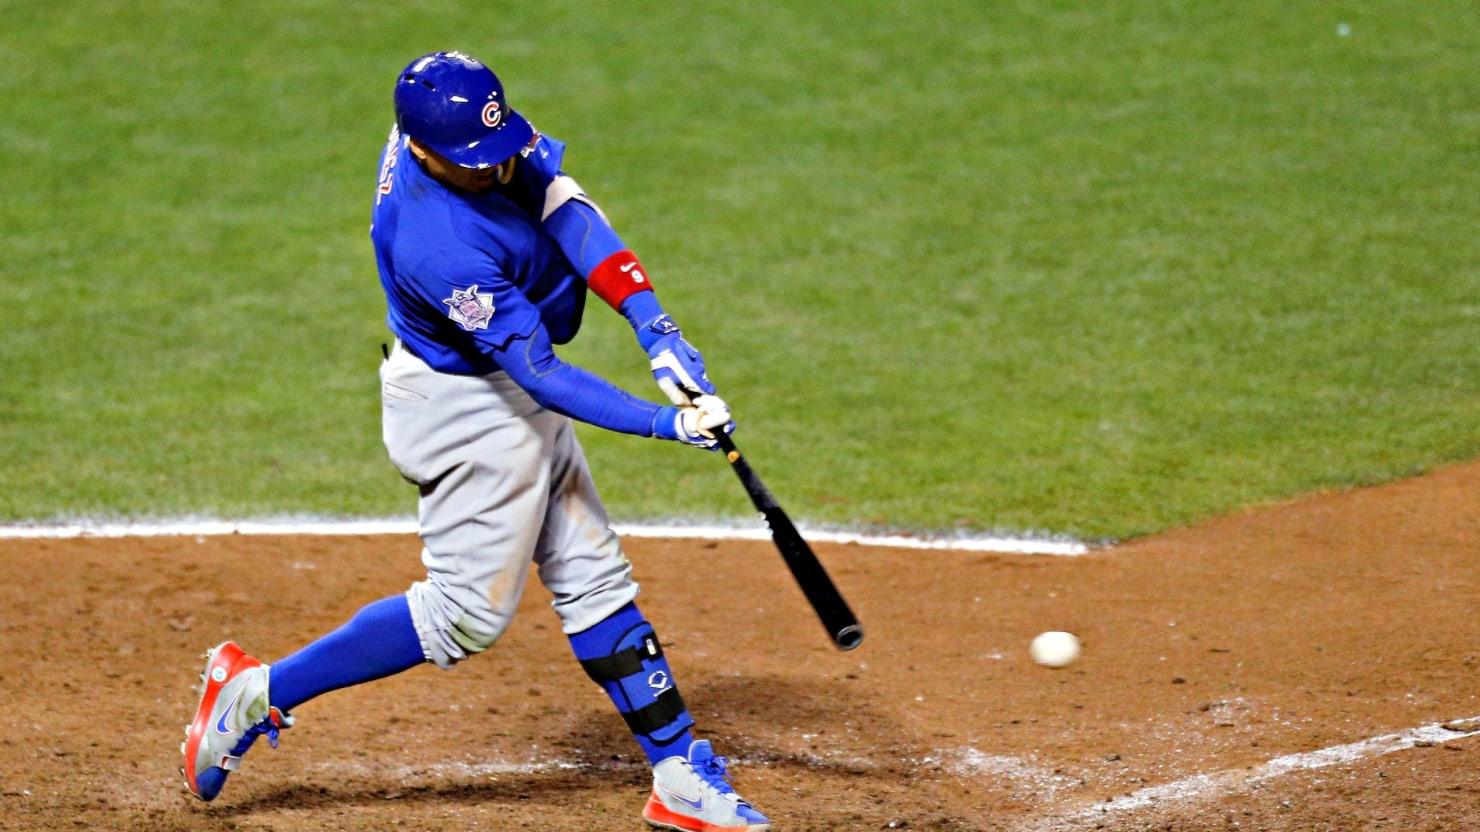 MLB.TV to stream World Series, select postseason games ...